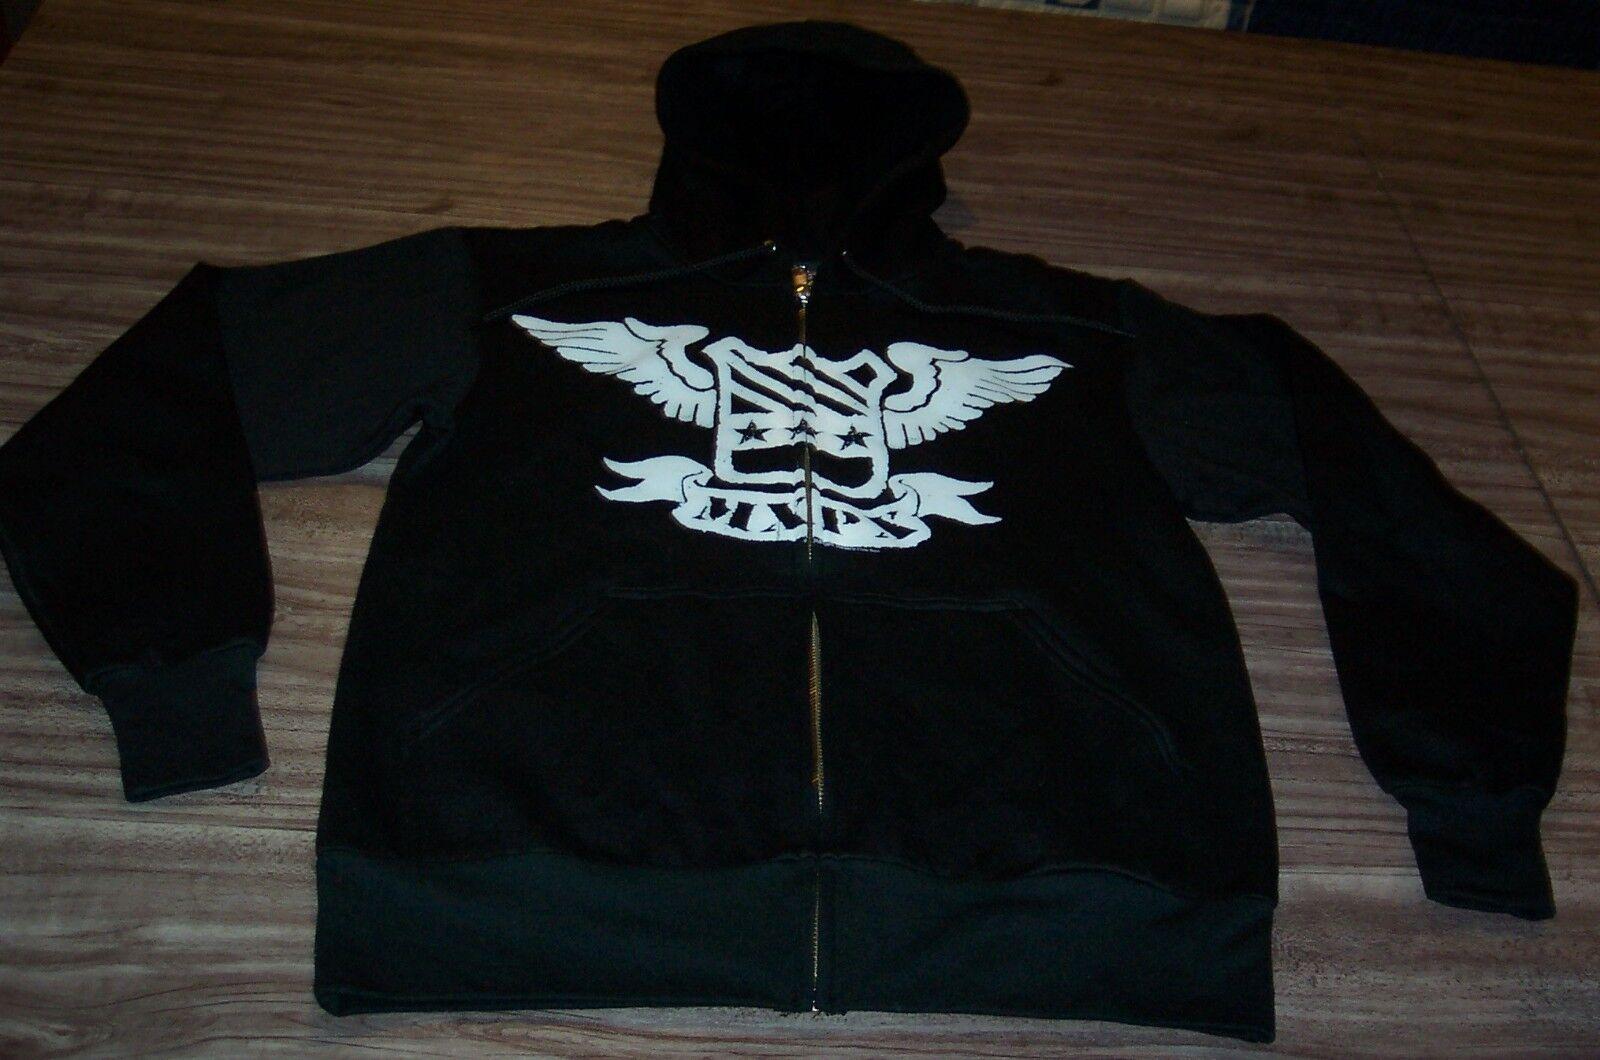 MXPX HOODIE HOODED Sweatshirt PUNK BAND SMALL NEW